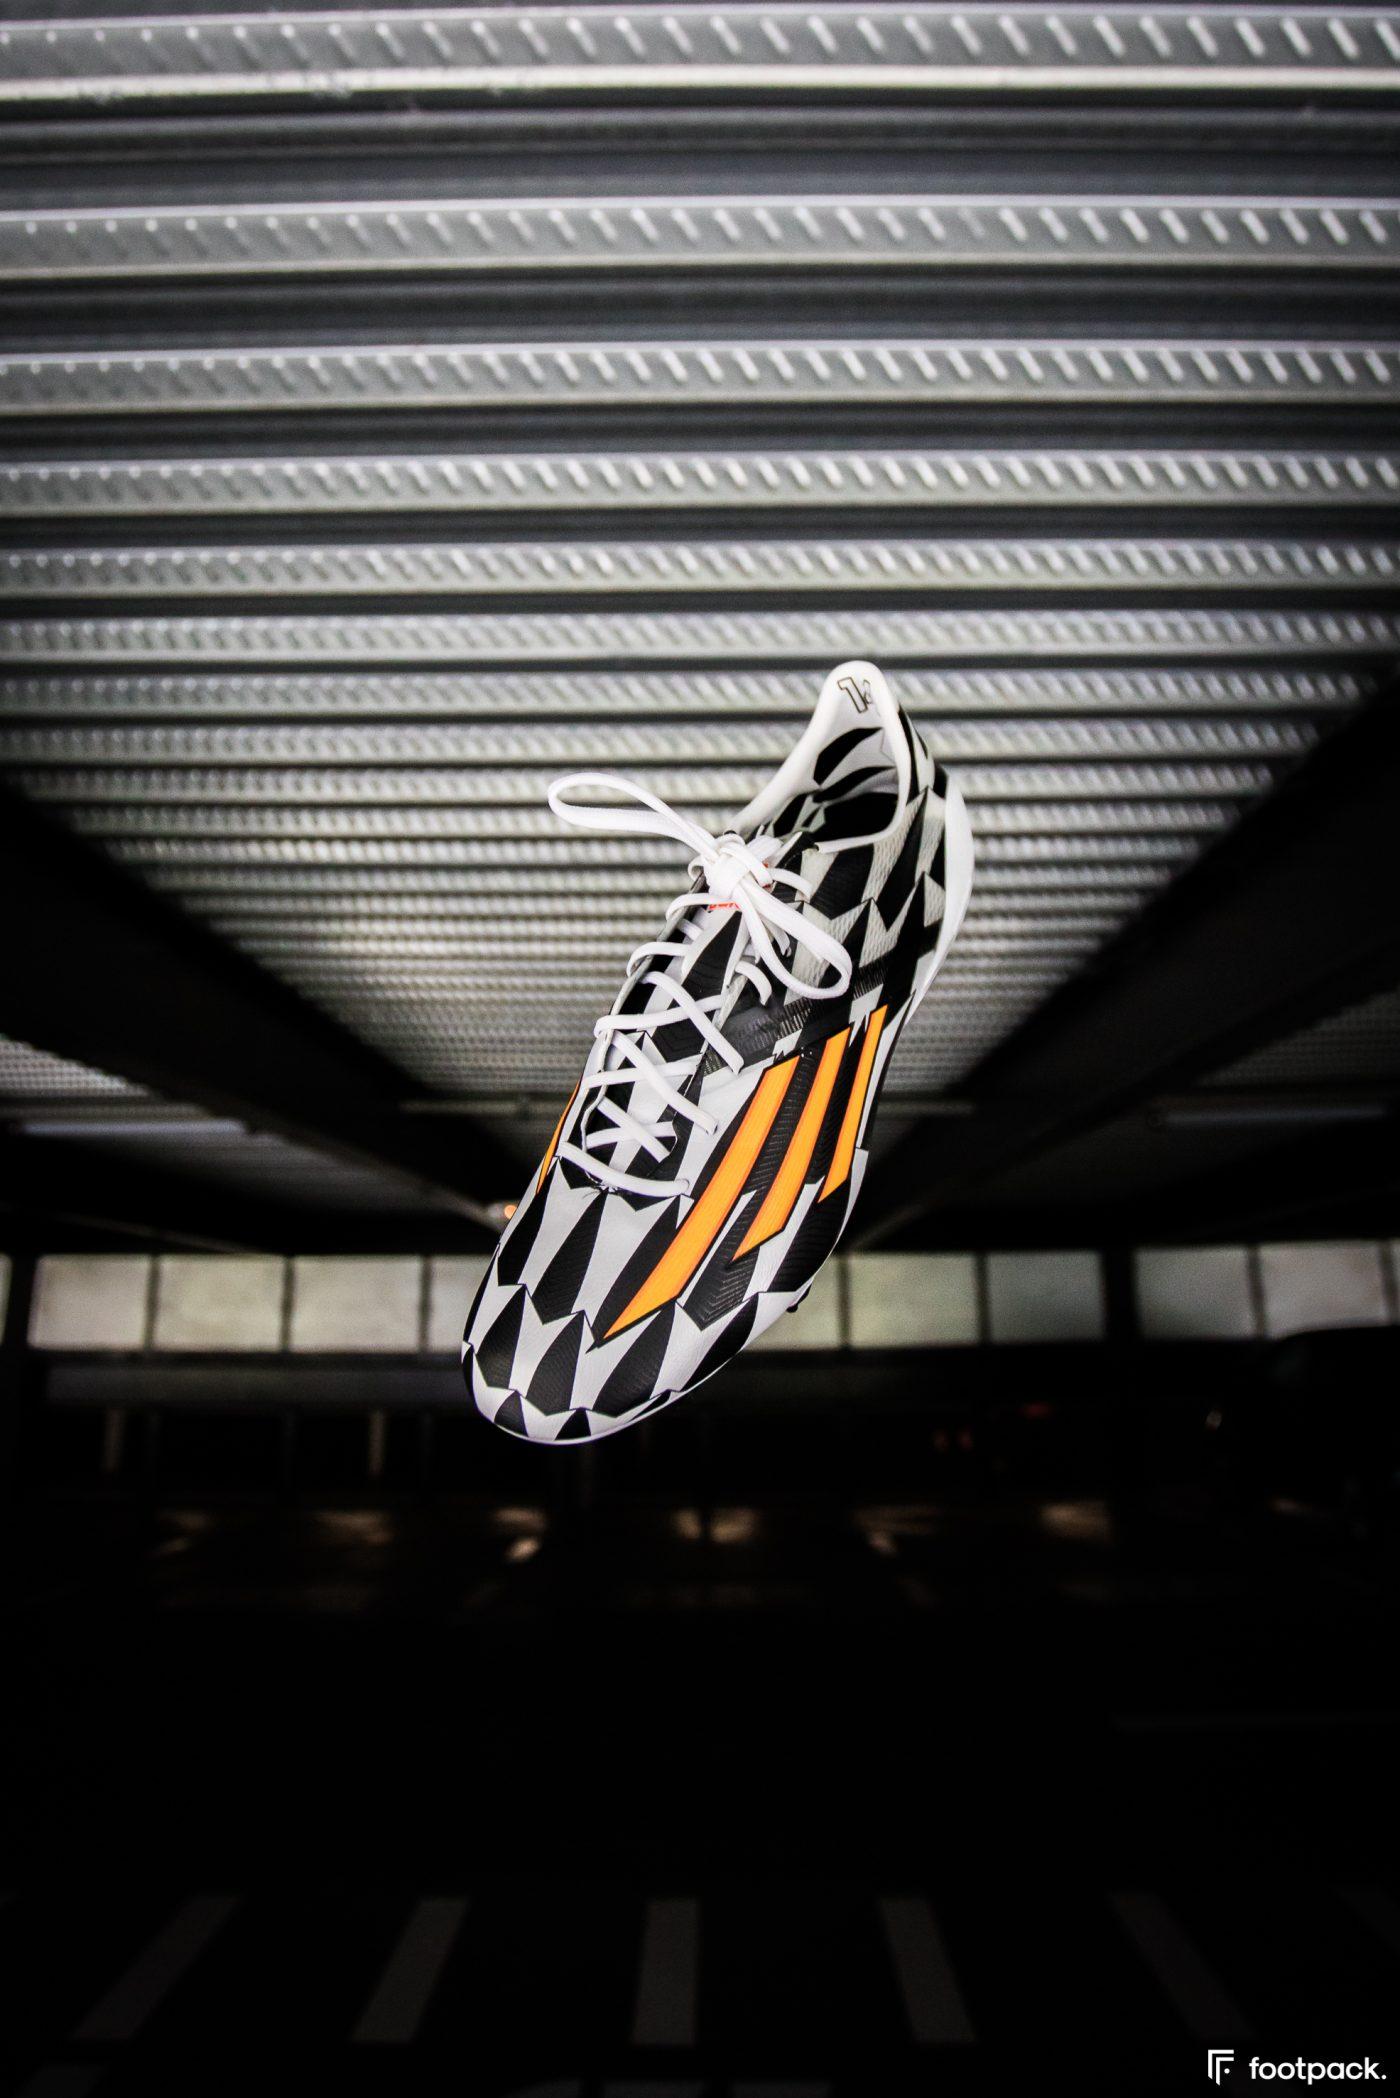 adidas-F50-adizero-battle-pack-coupe-du-monde-2014-footpack-22